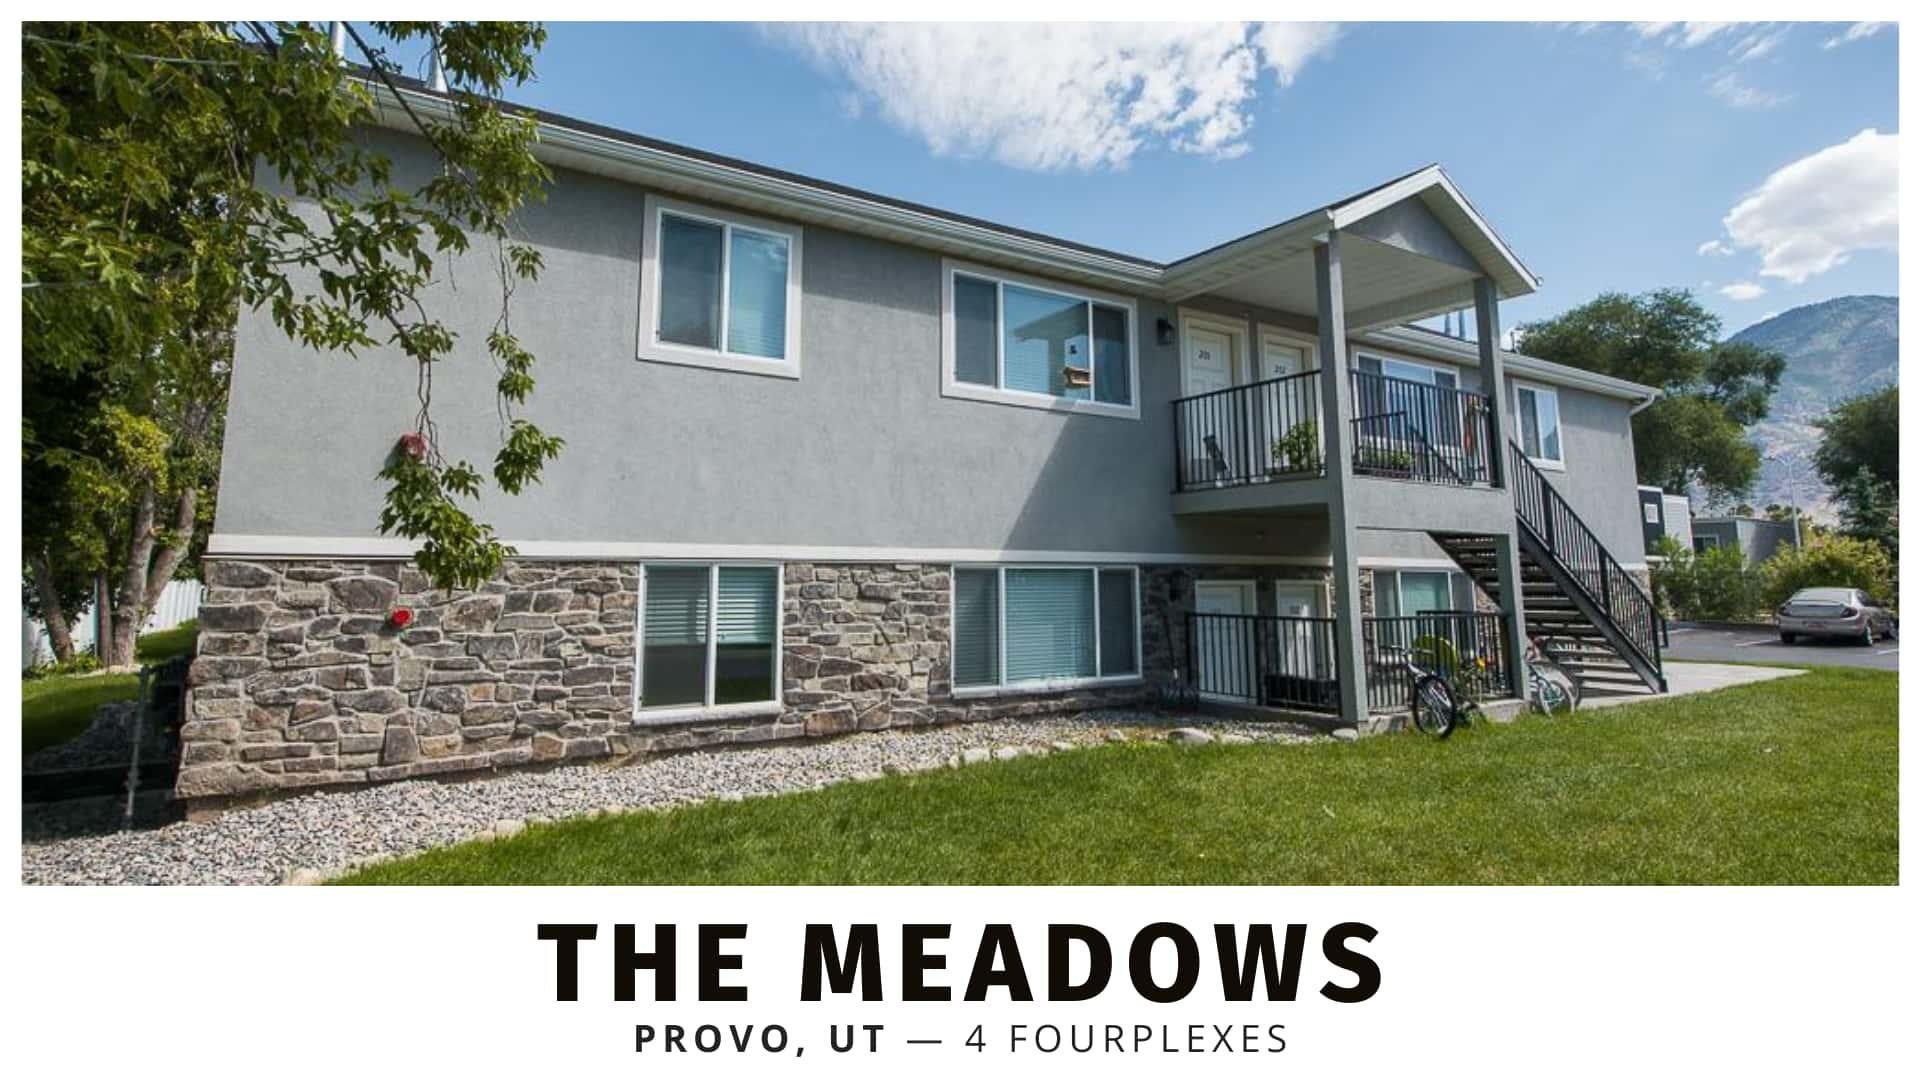 The Meadows fourplexes in Provo, Utah